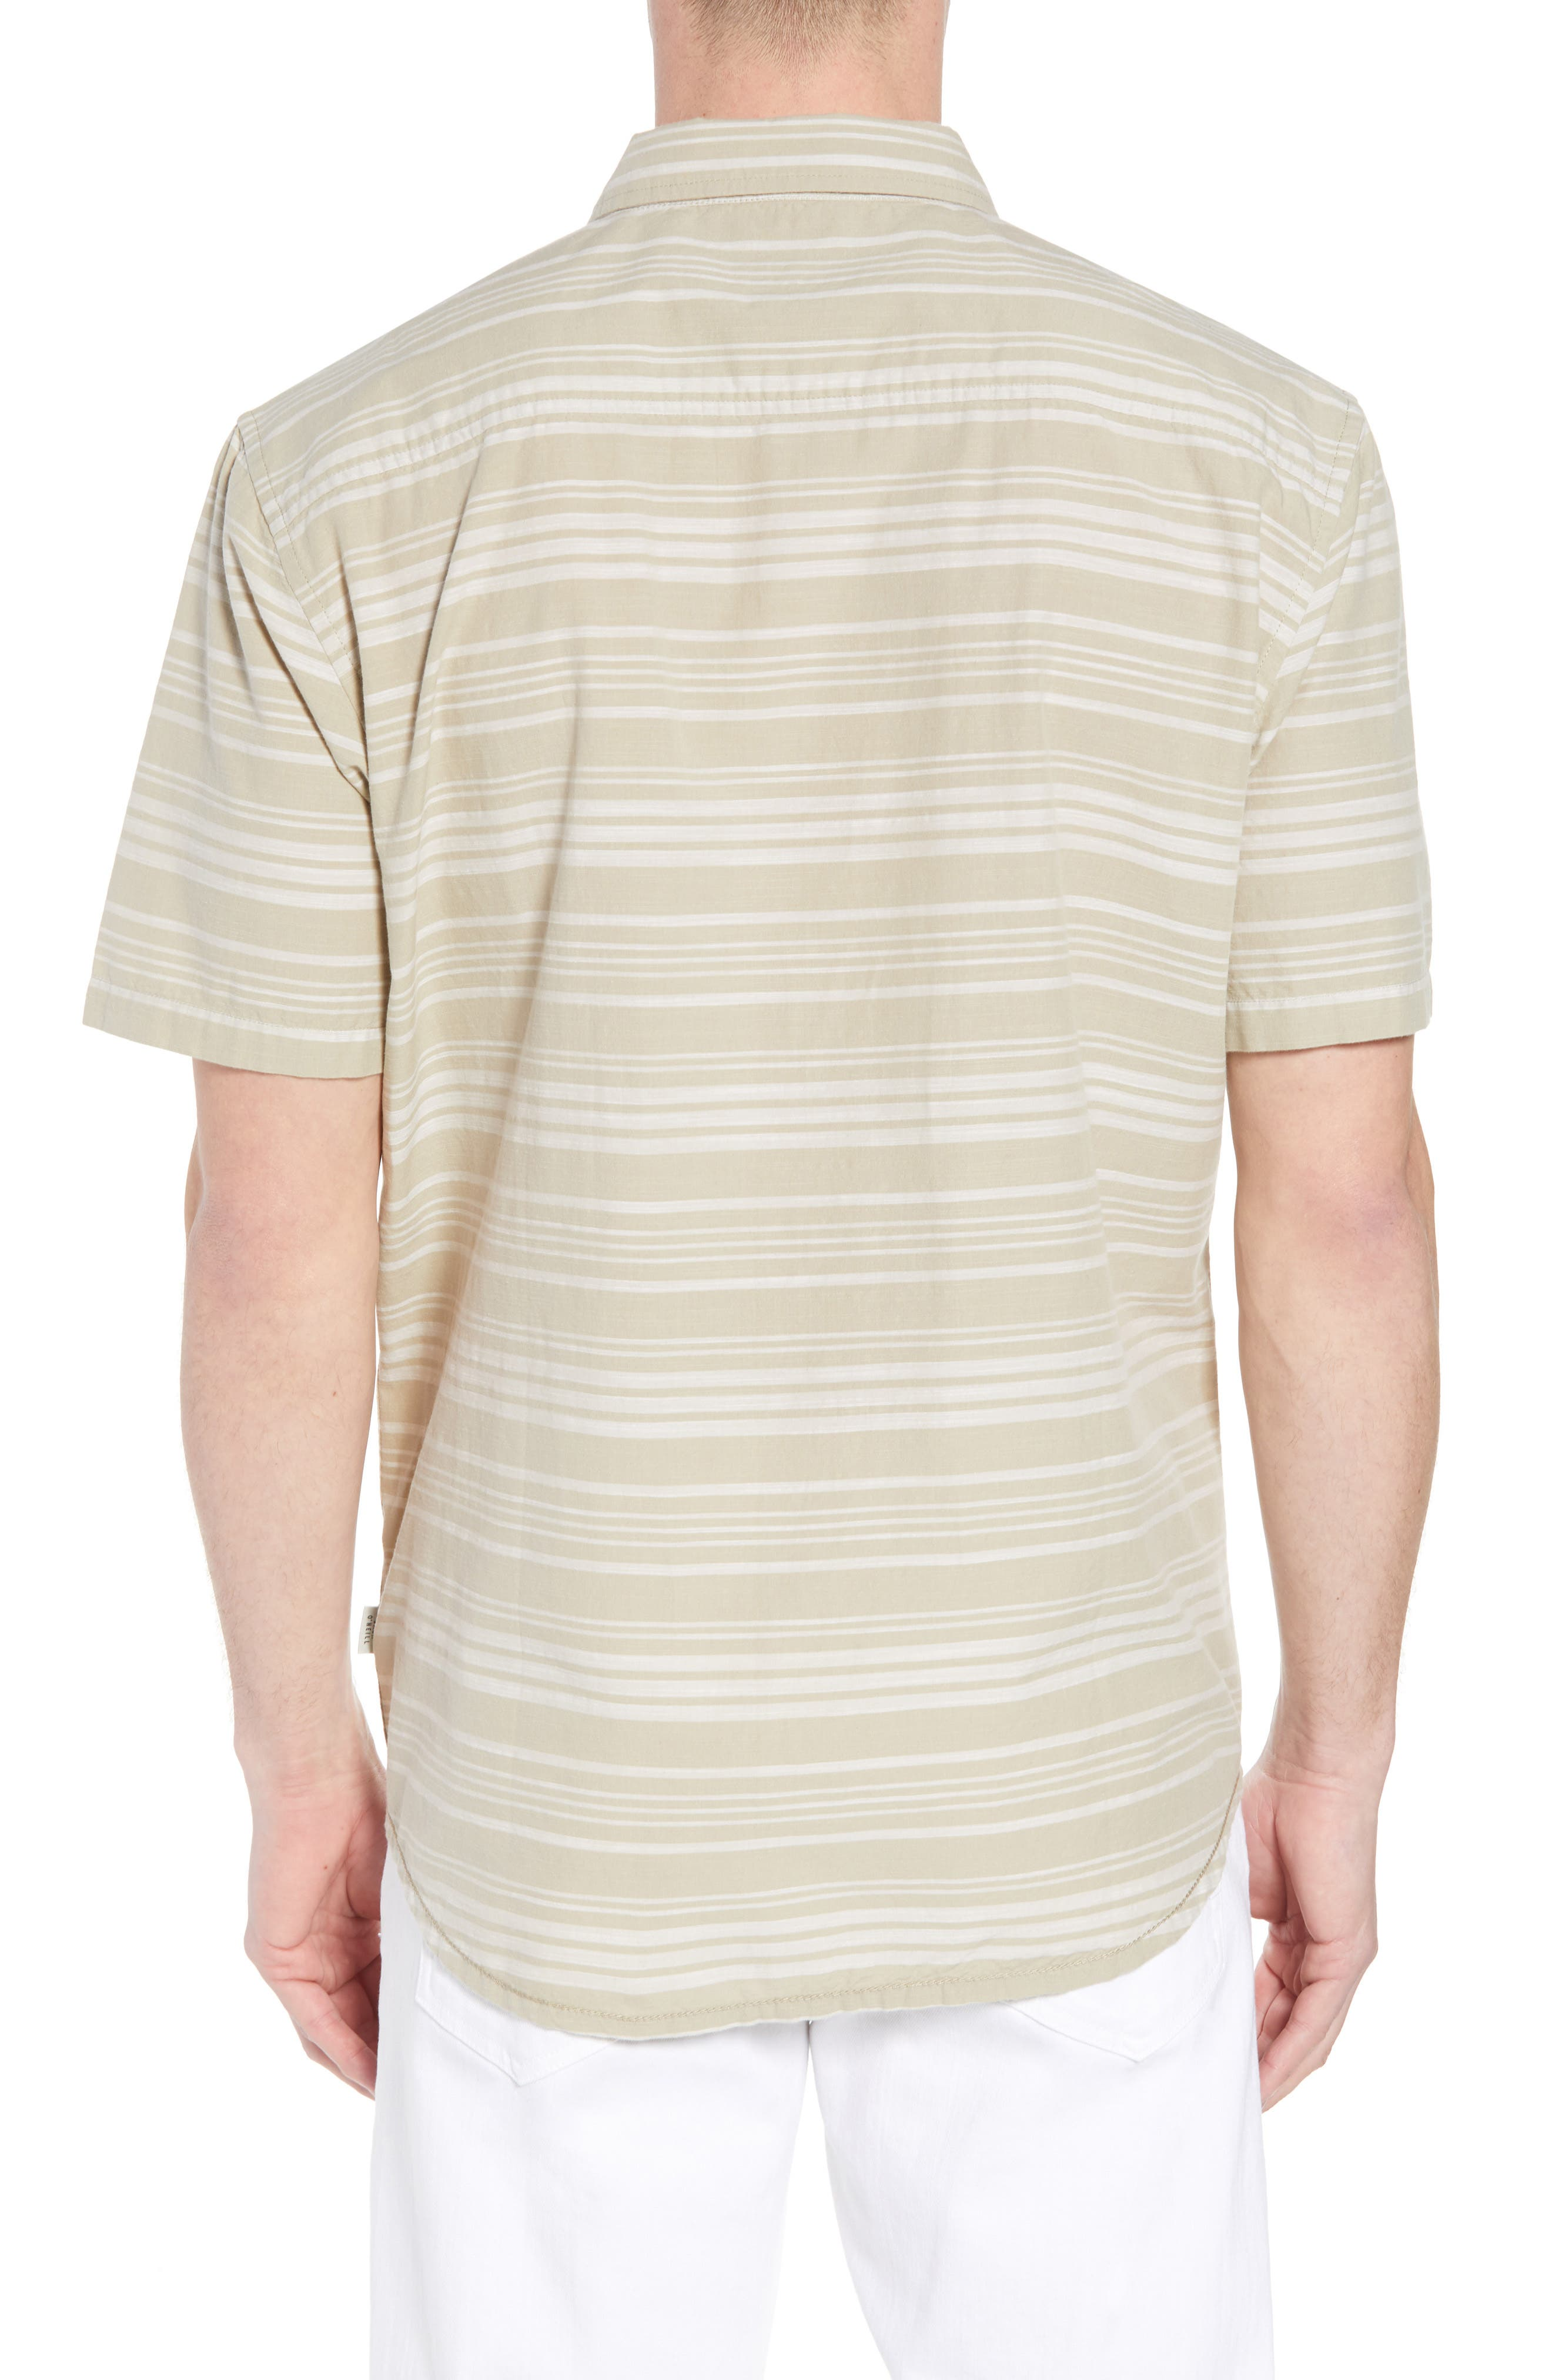 Line Up Sport Shirt,                             Alternate thumbnail 2, color,                             251